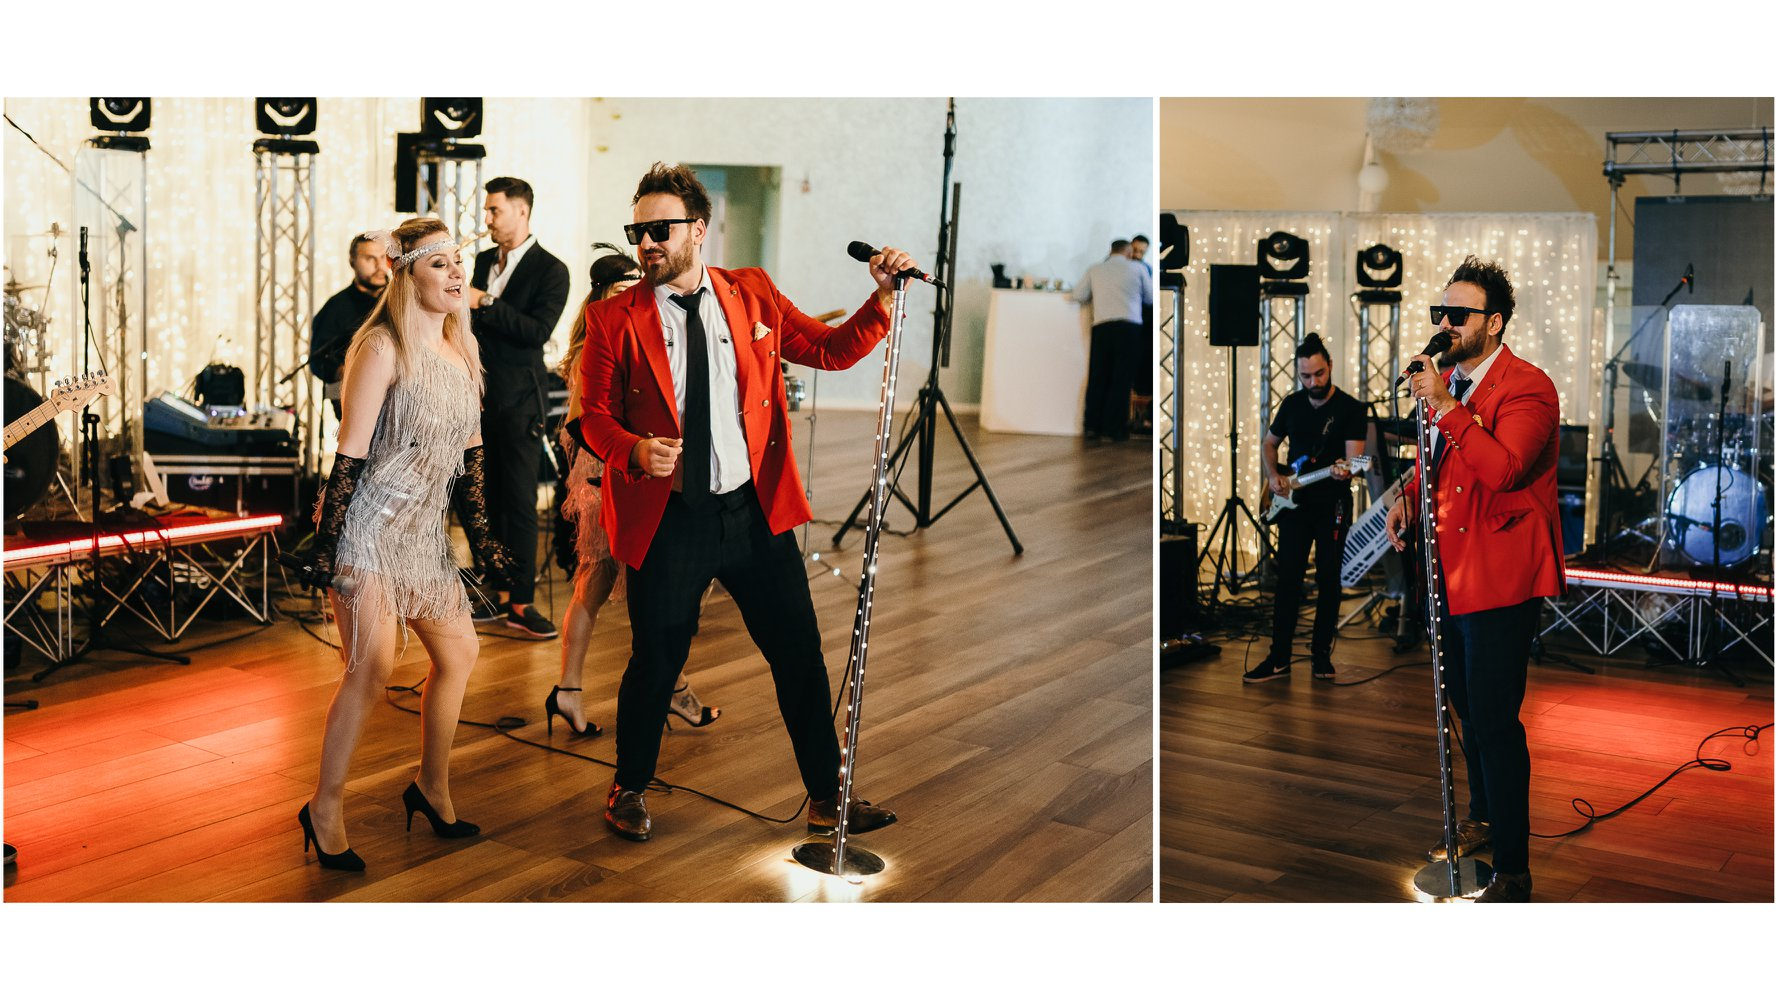 Formatie Soundcheck band Iasi evenimente 2019 nunta live show muzica trupa corporate party petrecere organizari petrecere dans invitat